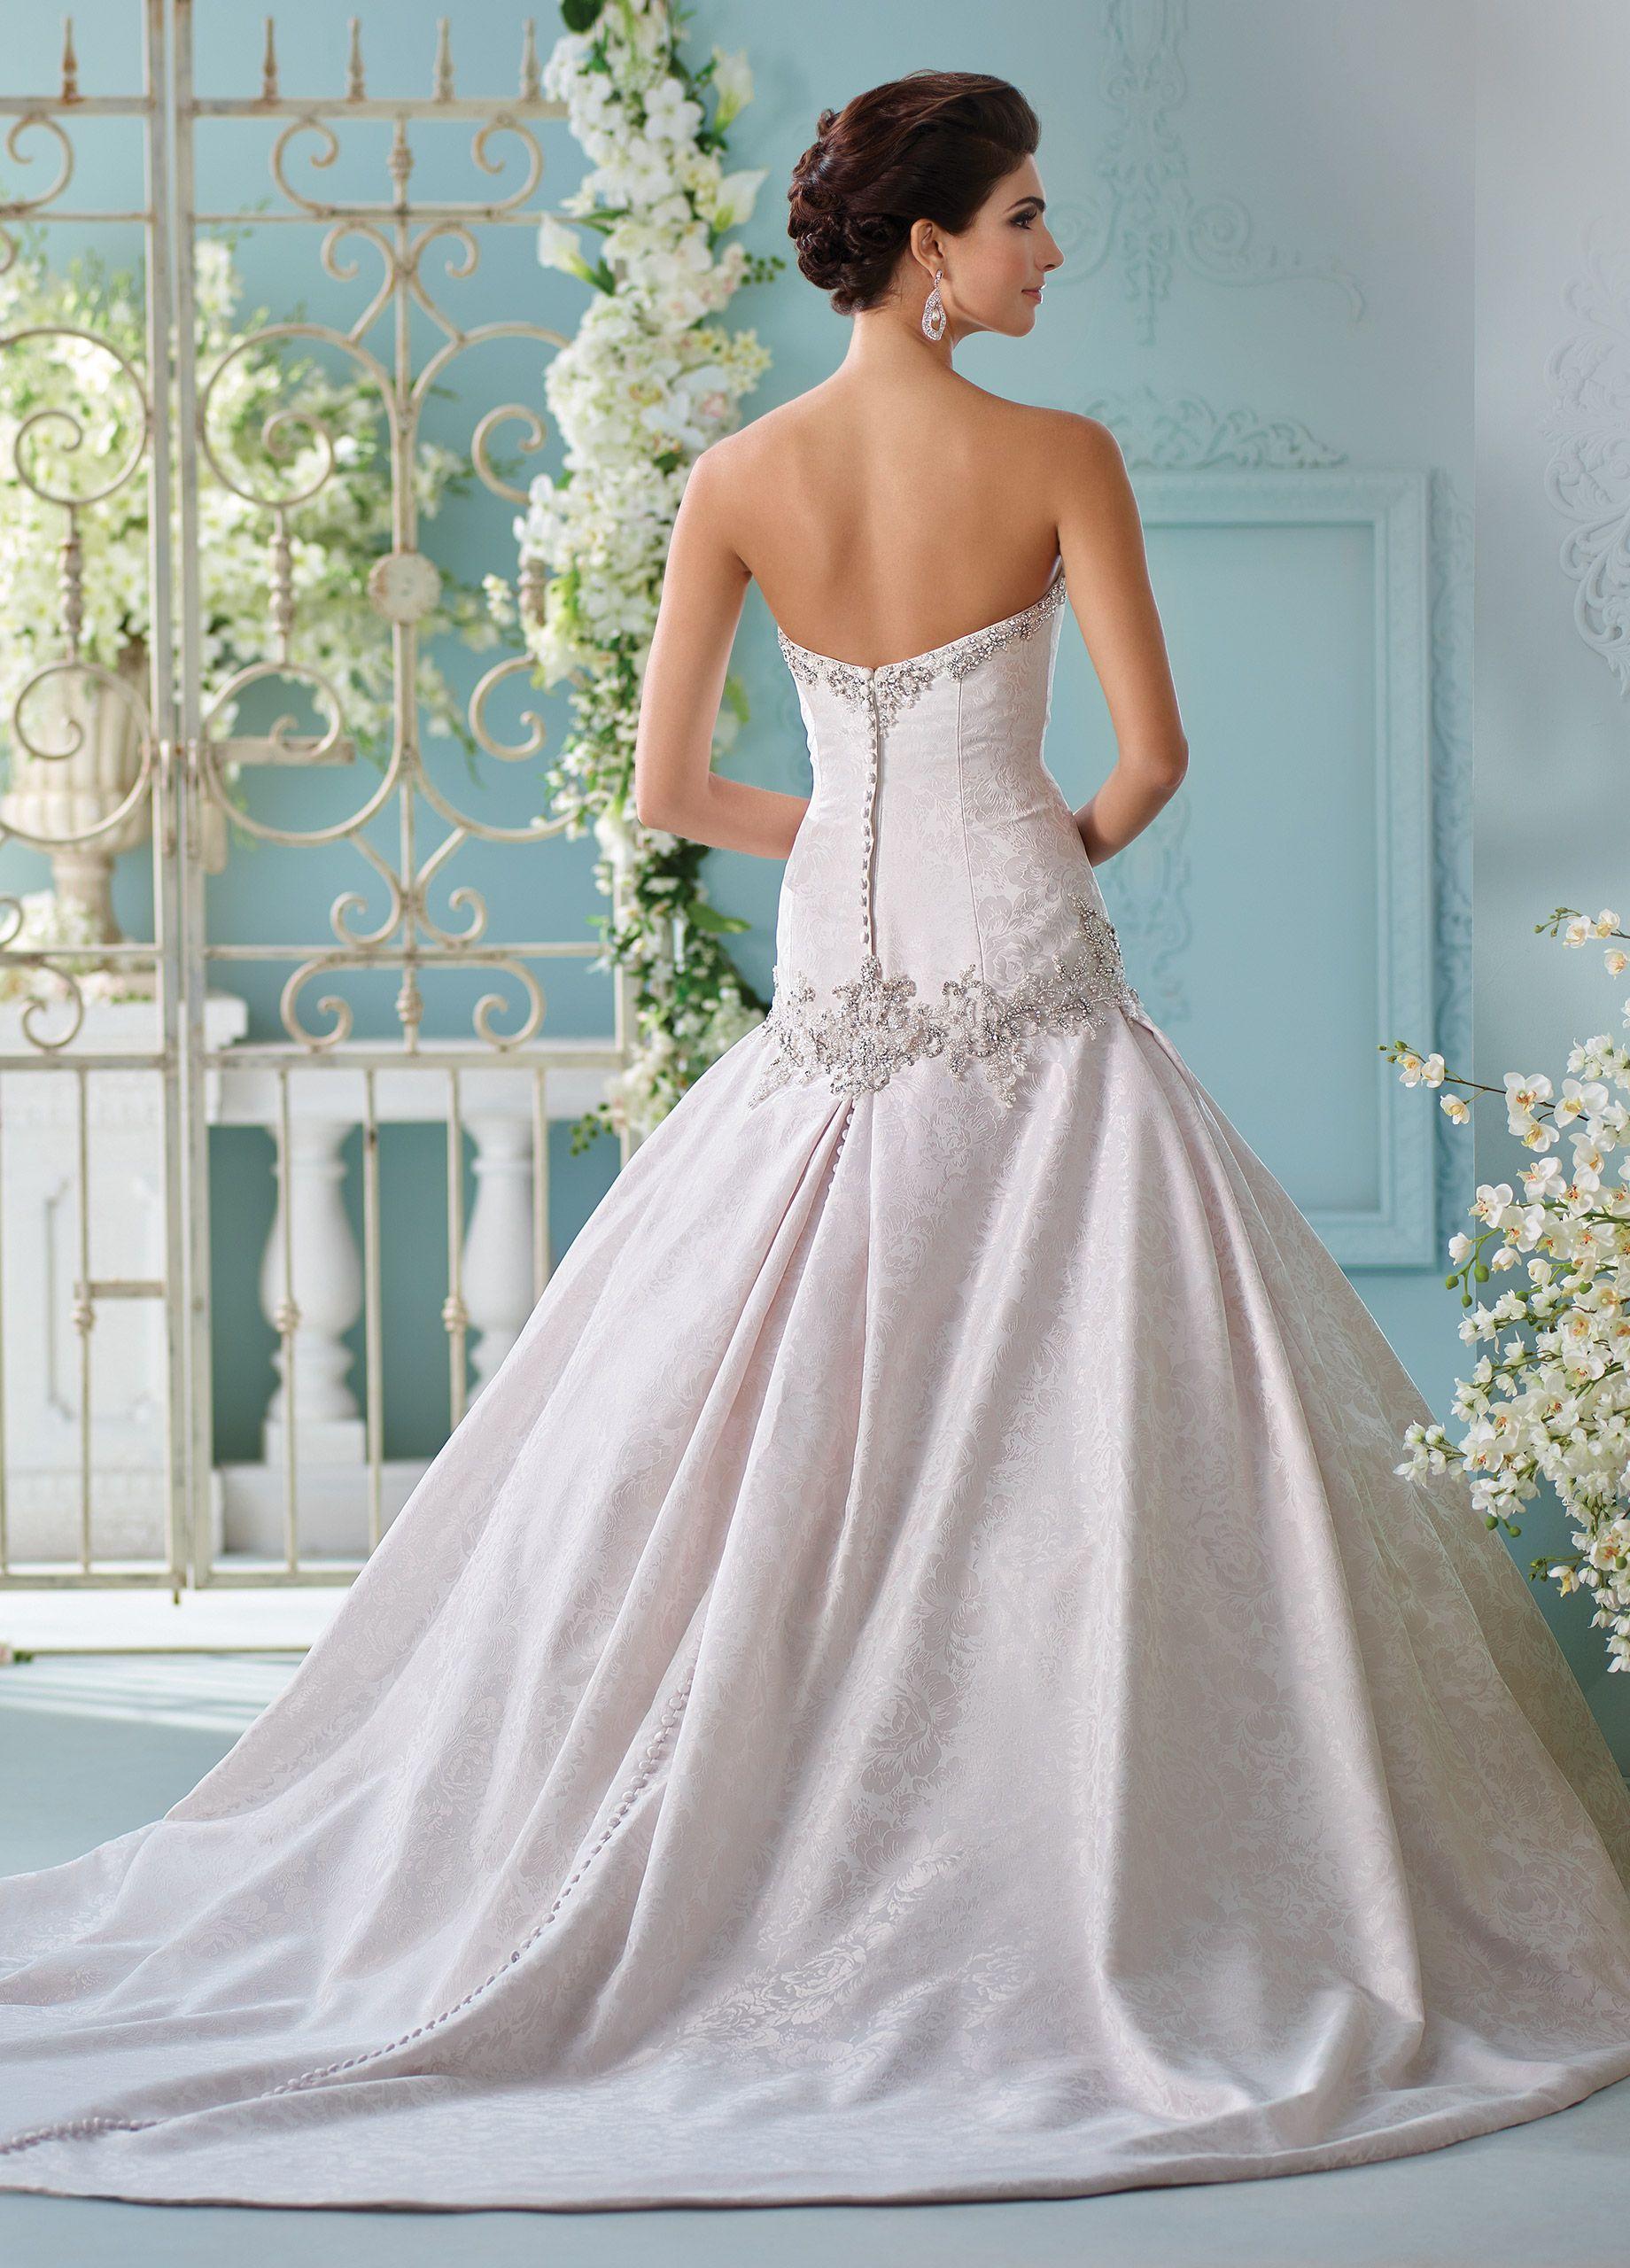 Mon cheri bridals cyan strapless jacquard full aline gown